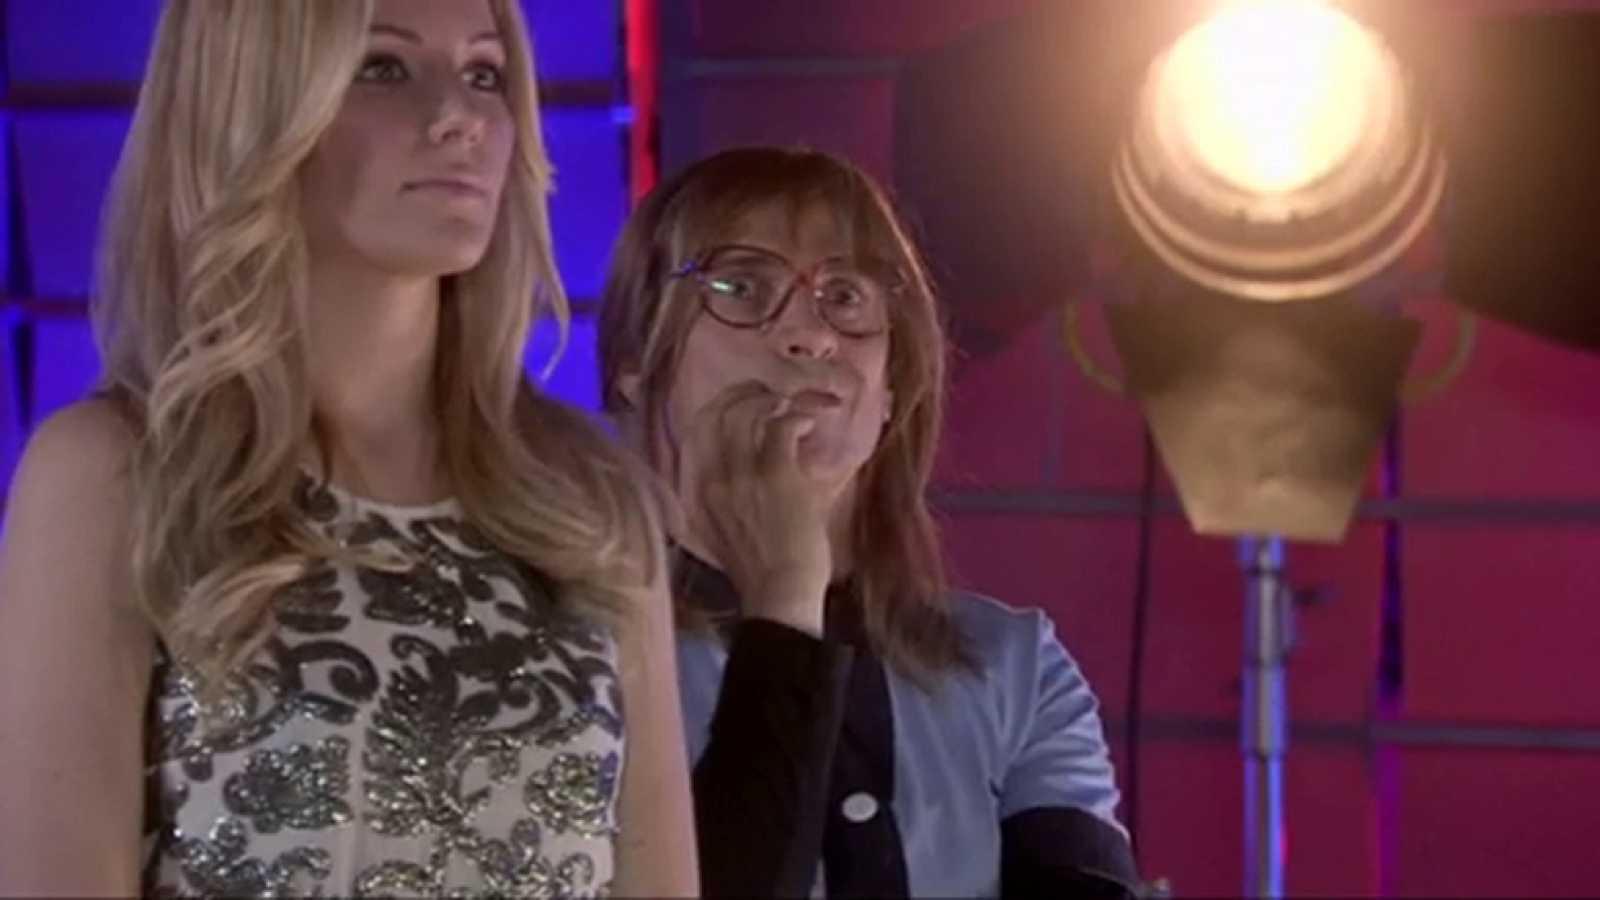 'José Mota presenta' - Edurne visita a Mota antes de la final de Eurovisión